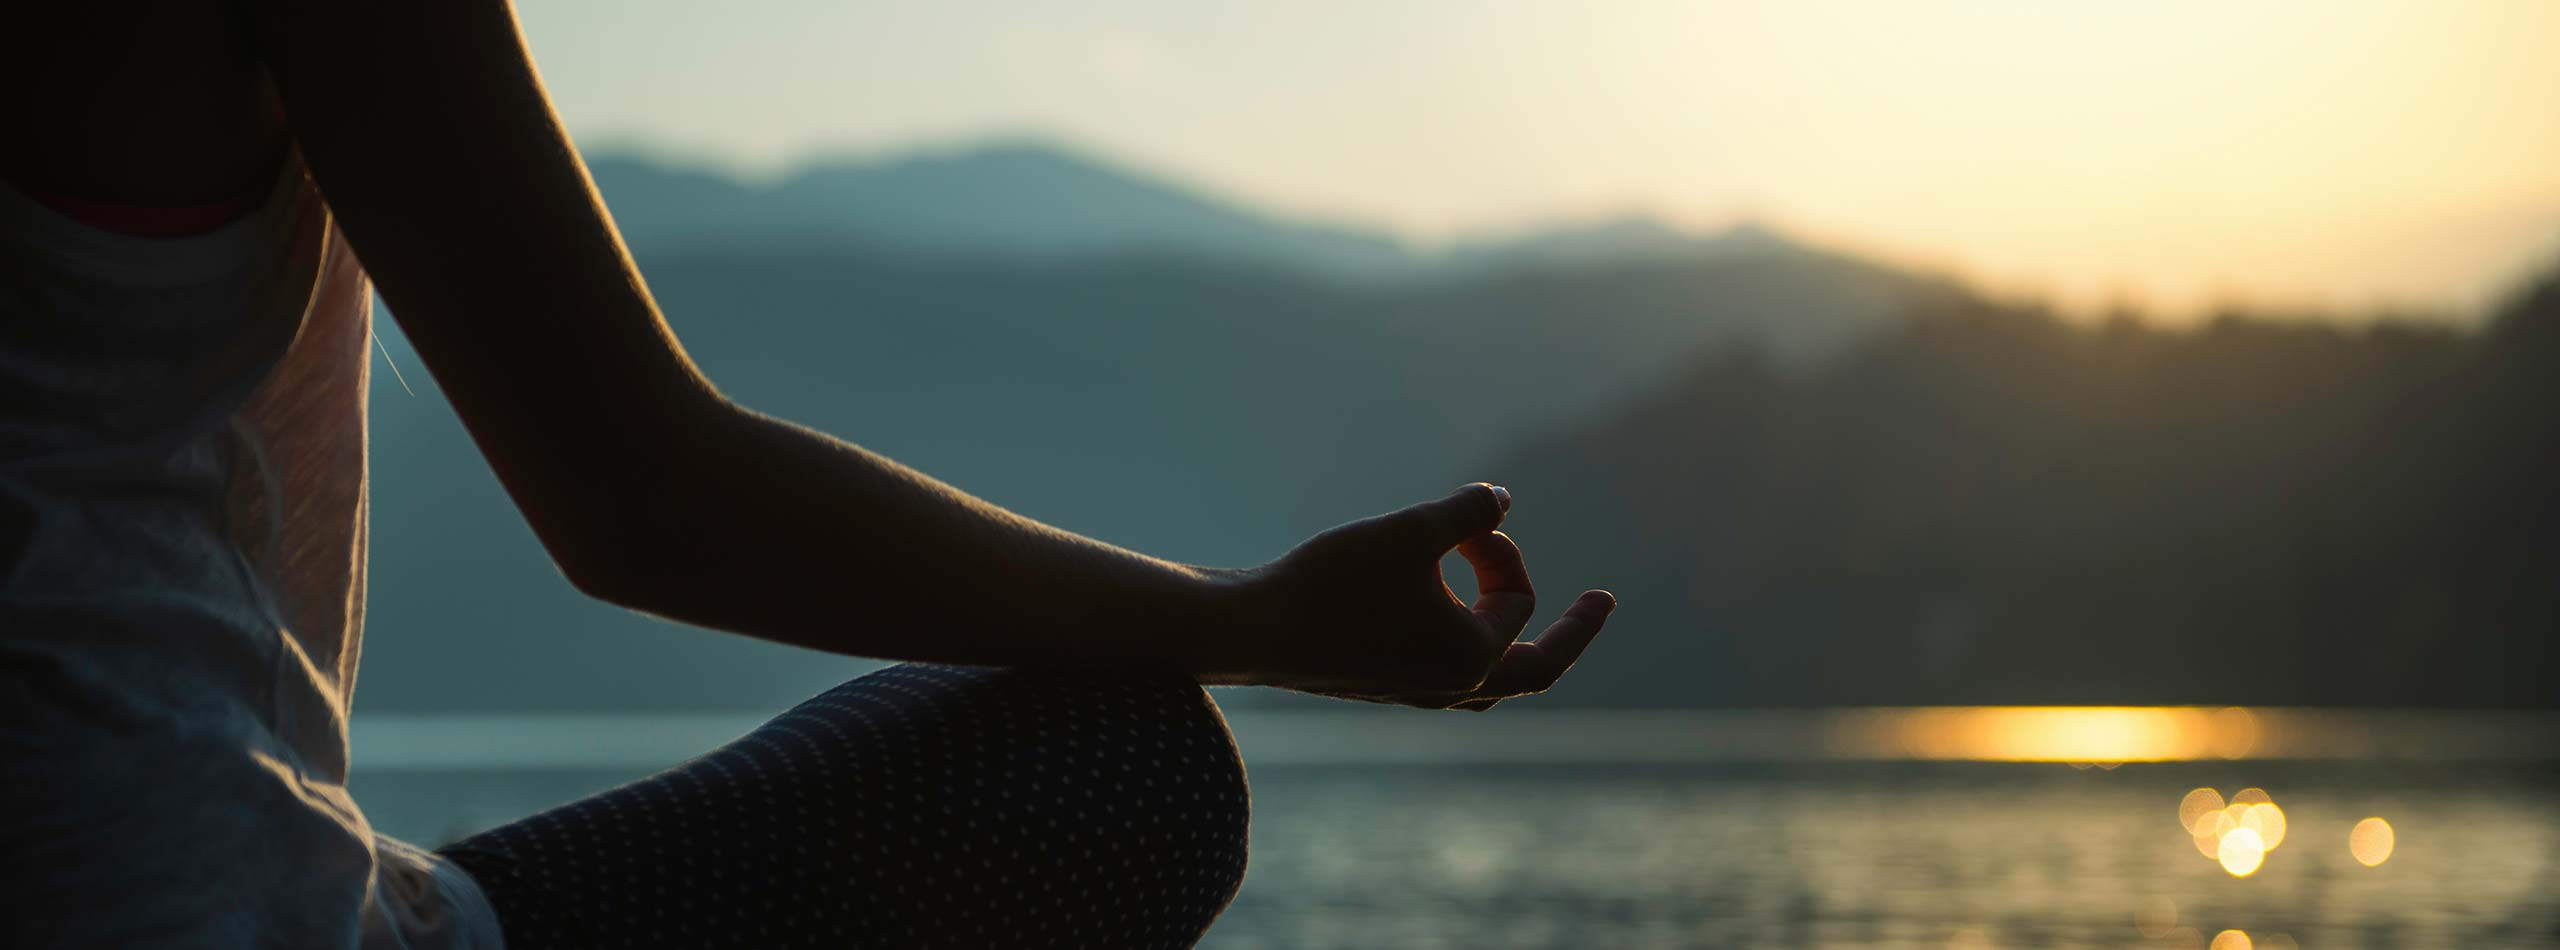 Ayurveda & Yoga Urlaub in Bad Waltersdorf in der Steiermark